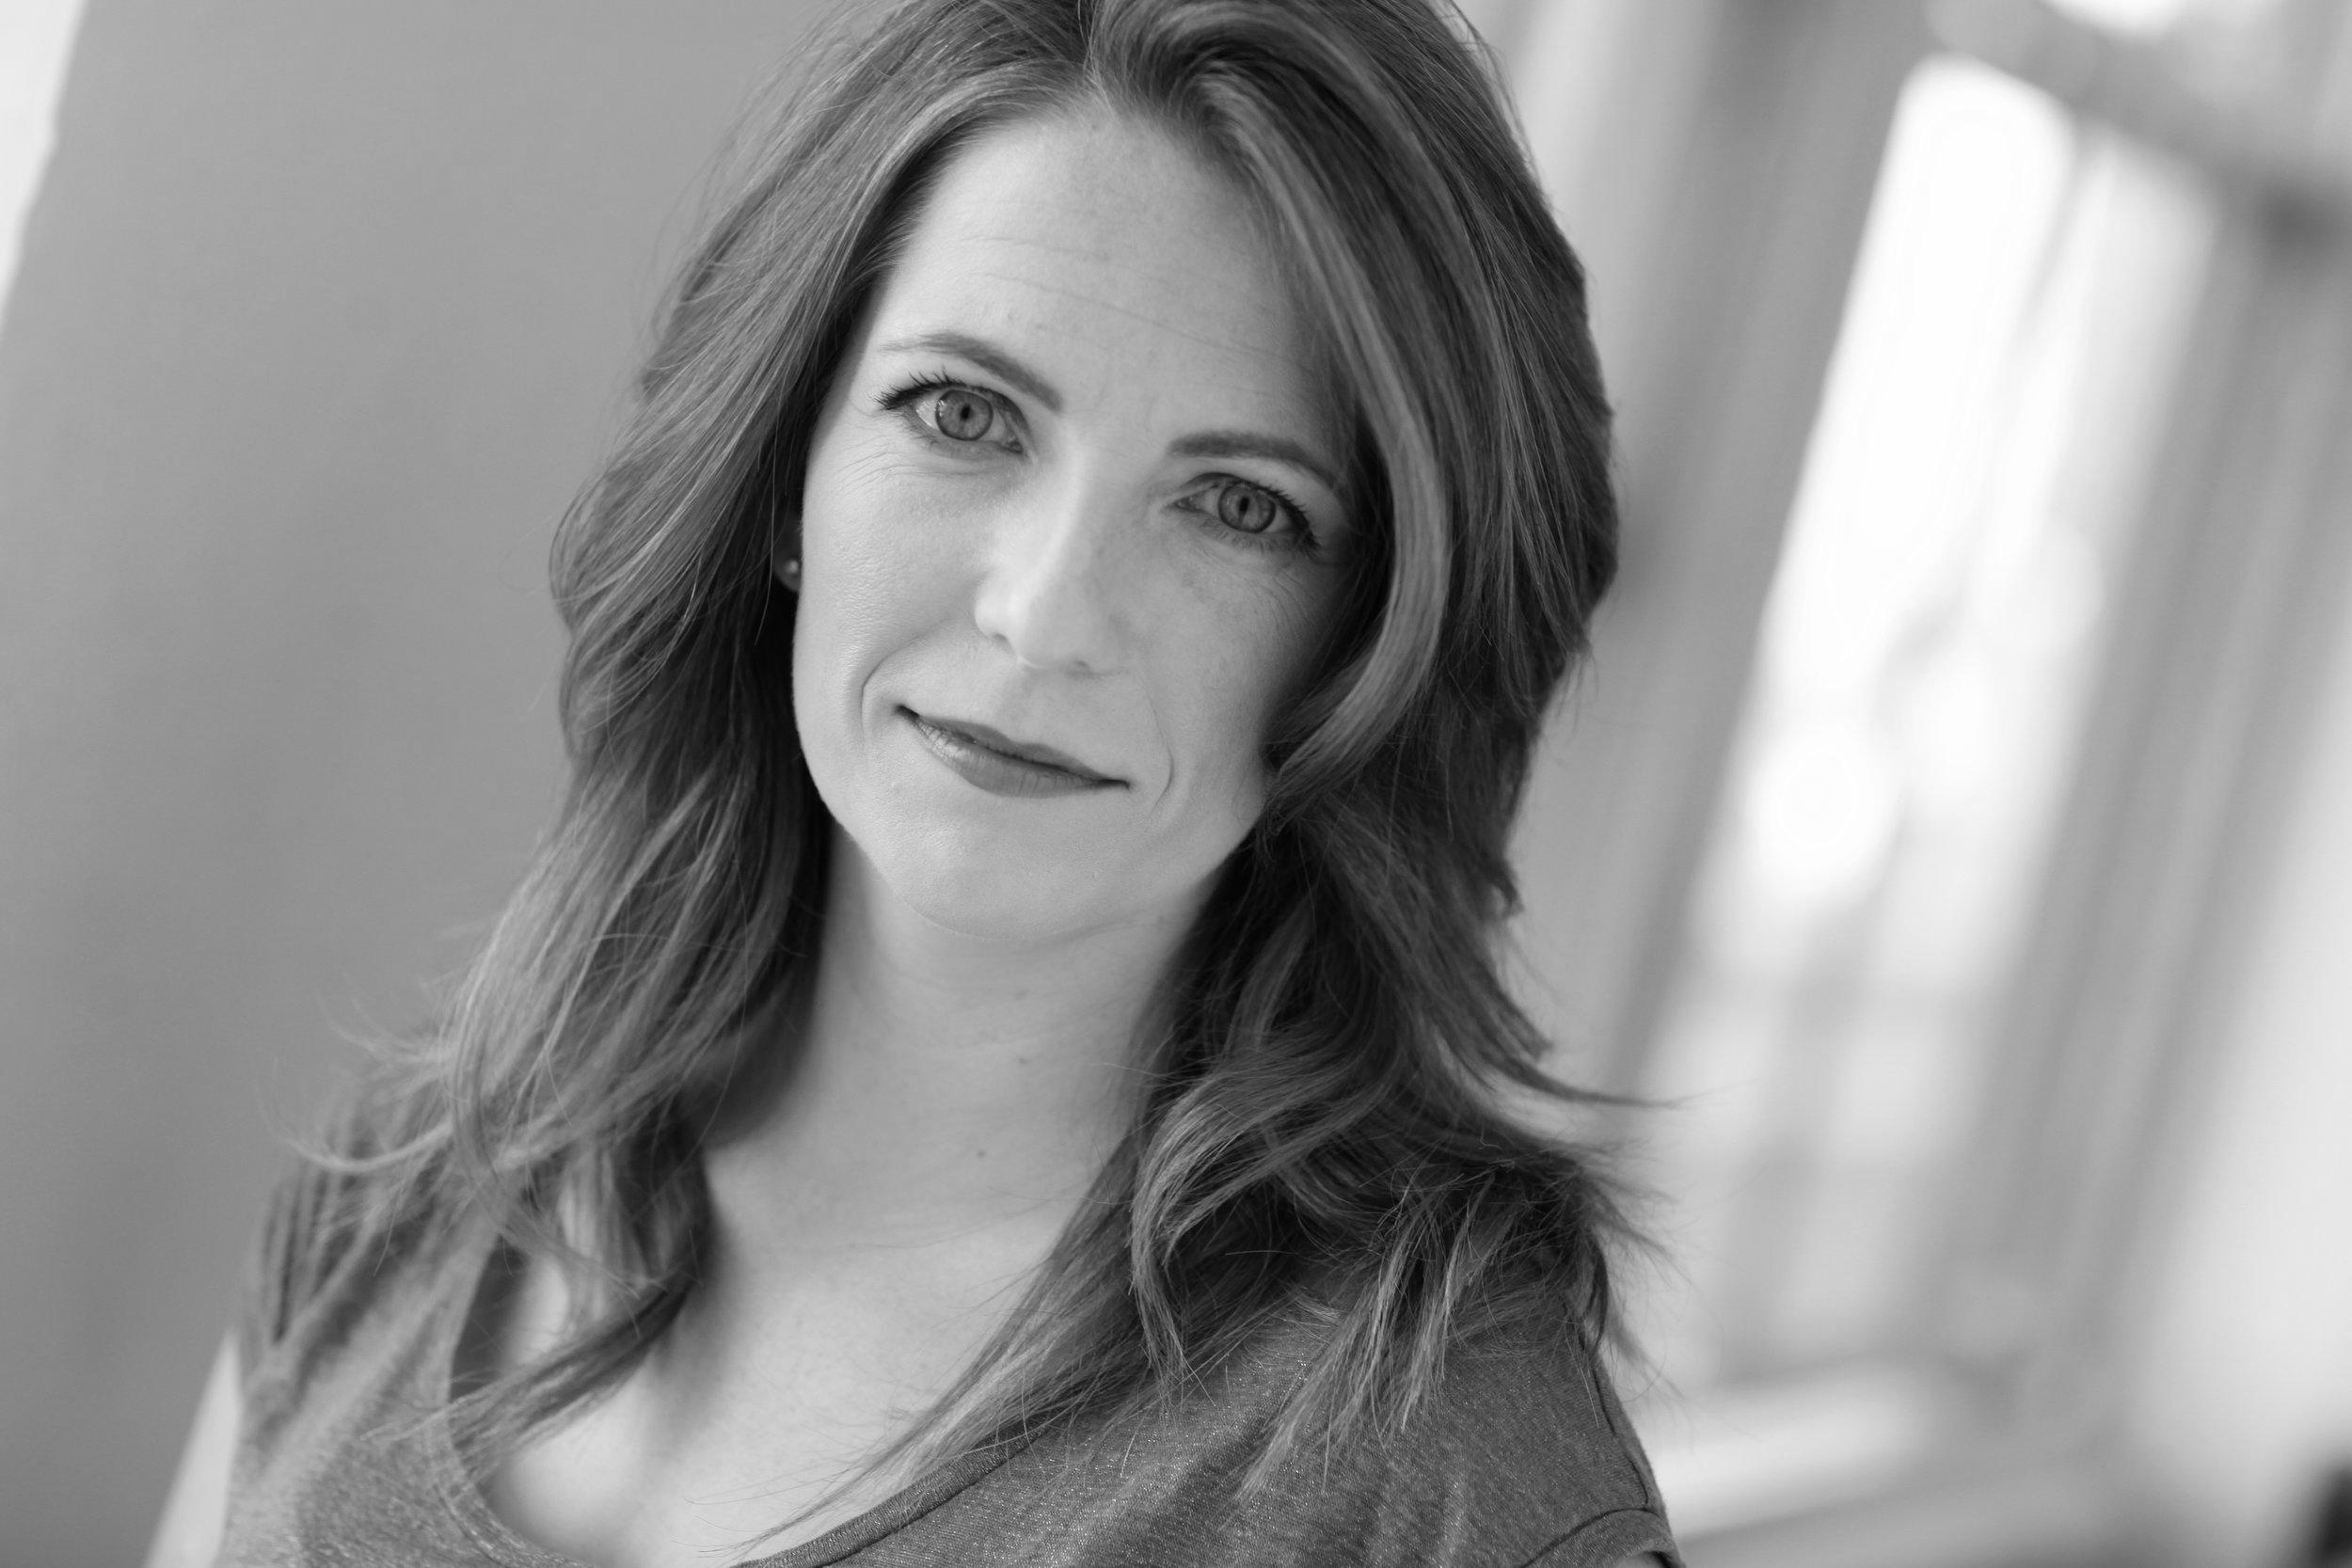 - EEVIN HARTSOUGHEevin Hartsough is an actor/writer/filmmaker living in Manhattan. Learn more about her work at EevinHartsough.com and MyCarl.org